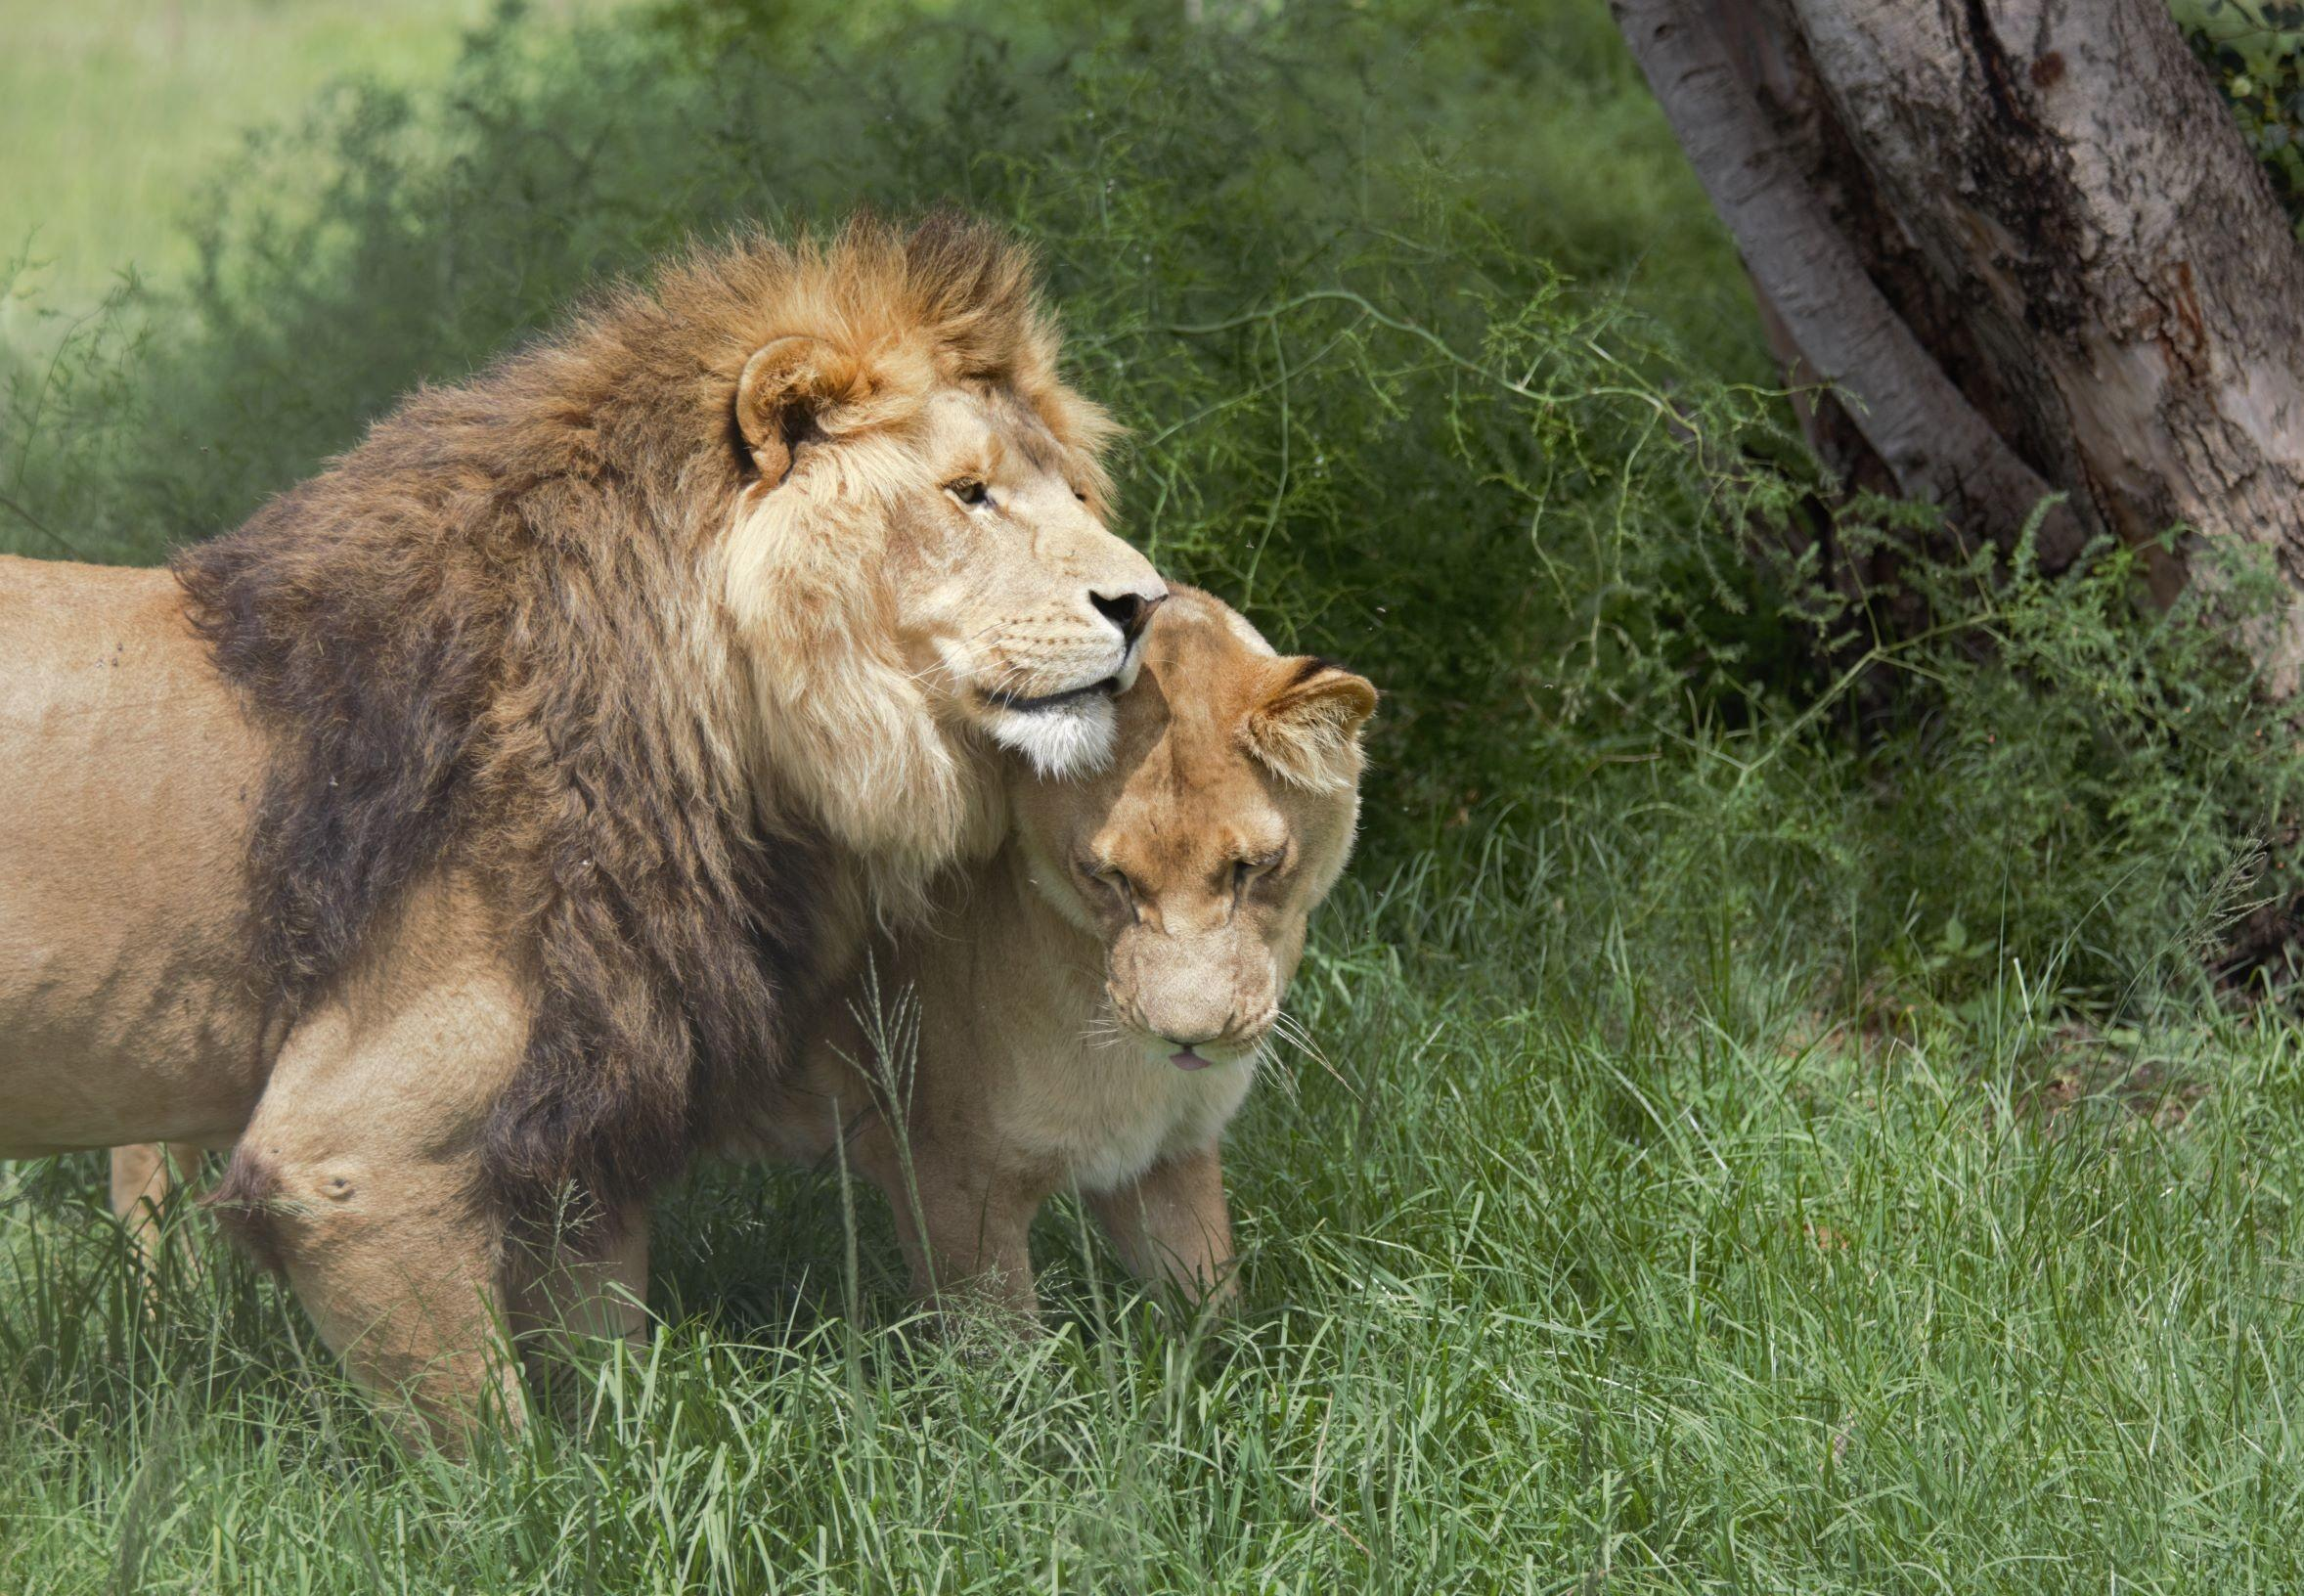 Lions in LIONSROCK